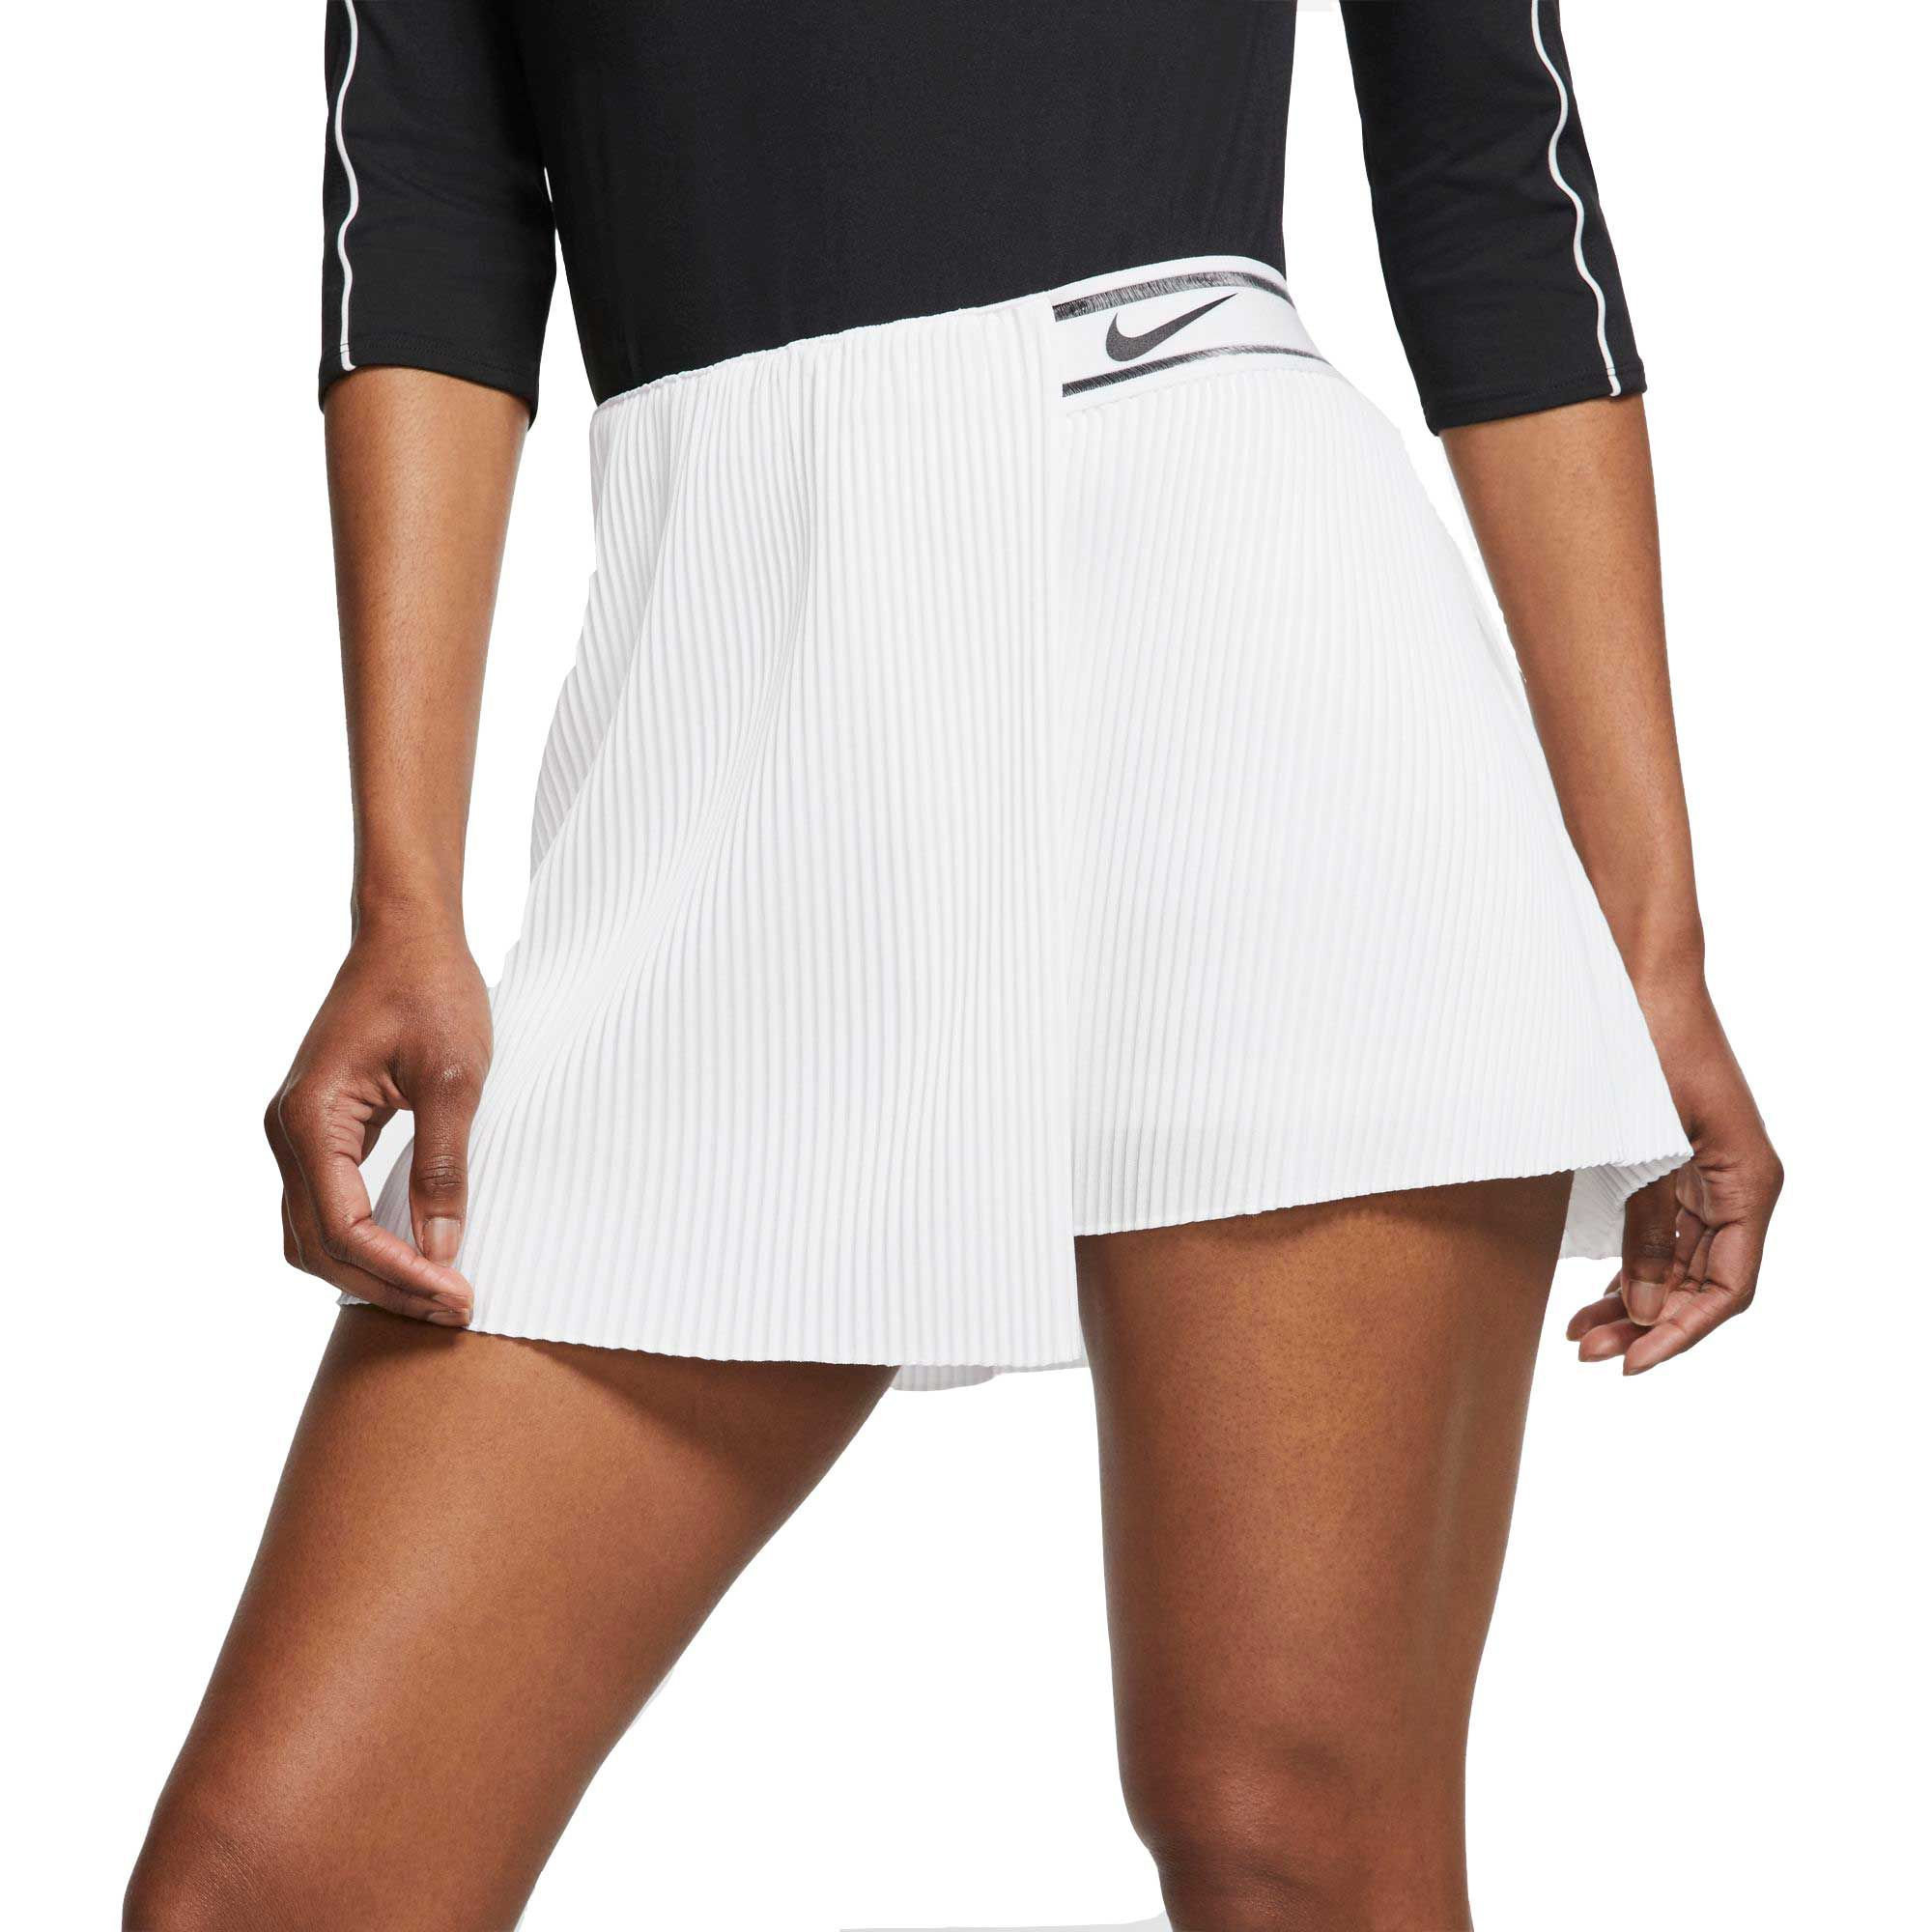 Nike Women S Court Slam Tennis Skirt Size Xl White In 2020 Tennis Outfit Women Womens Tennis Skirts Tennis Clothes